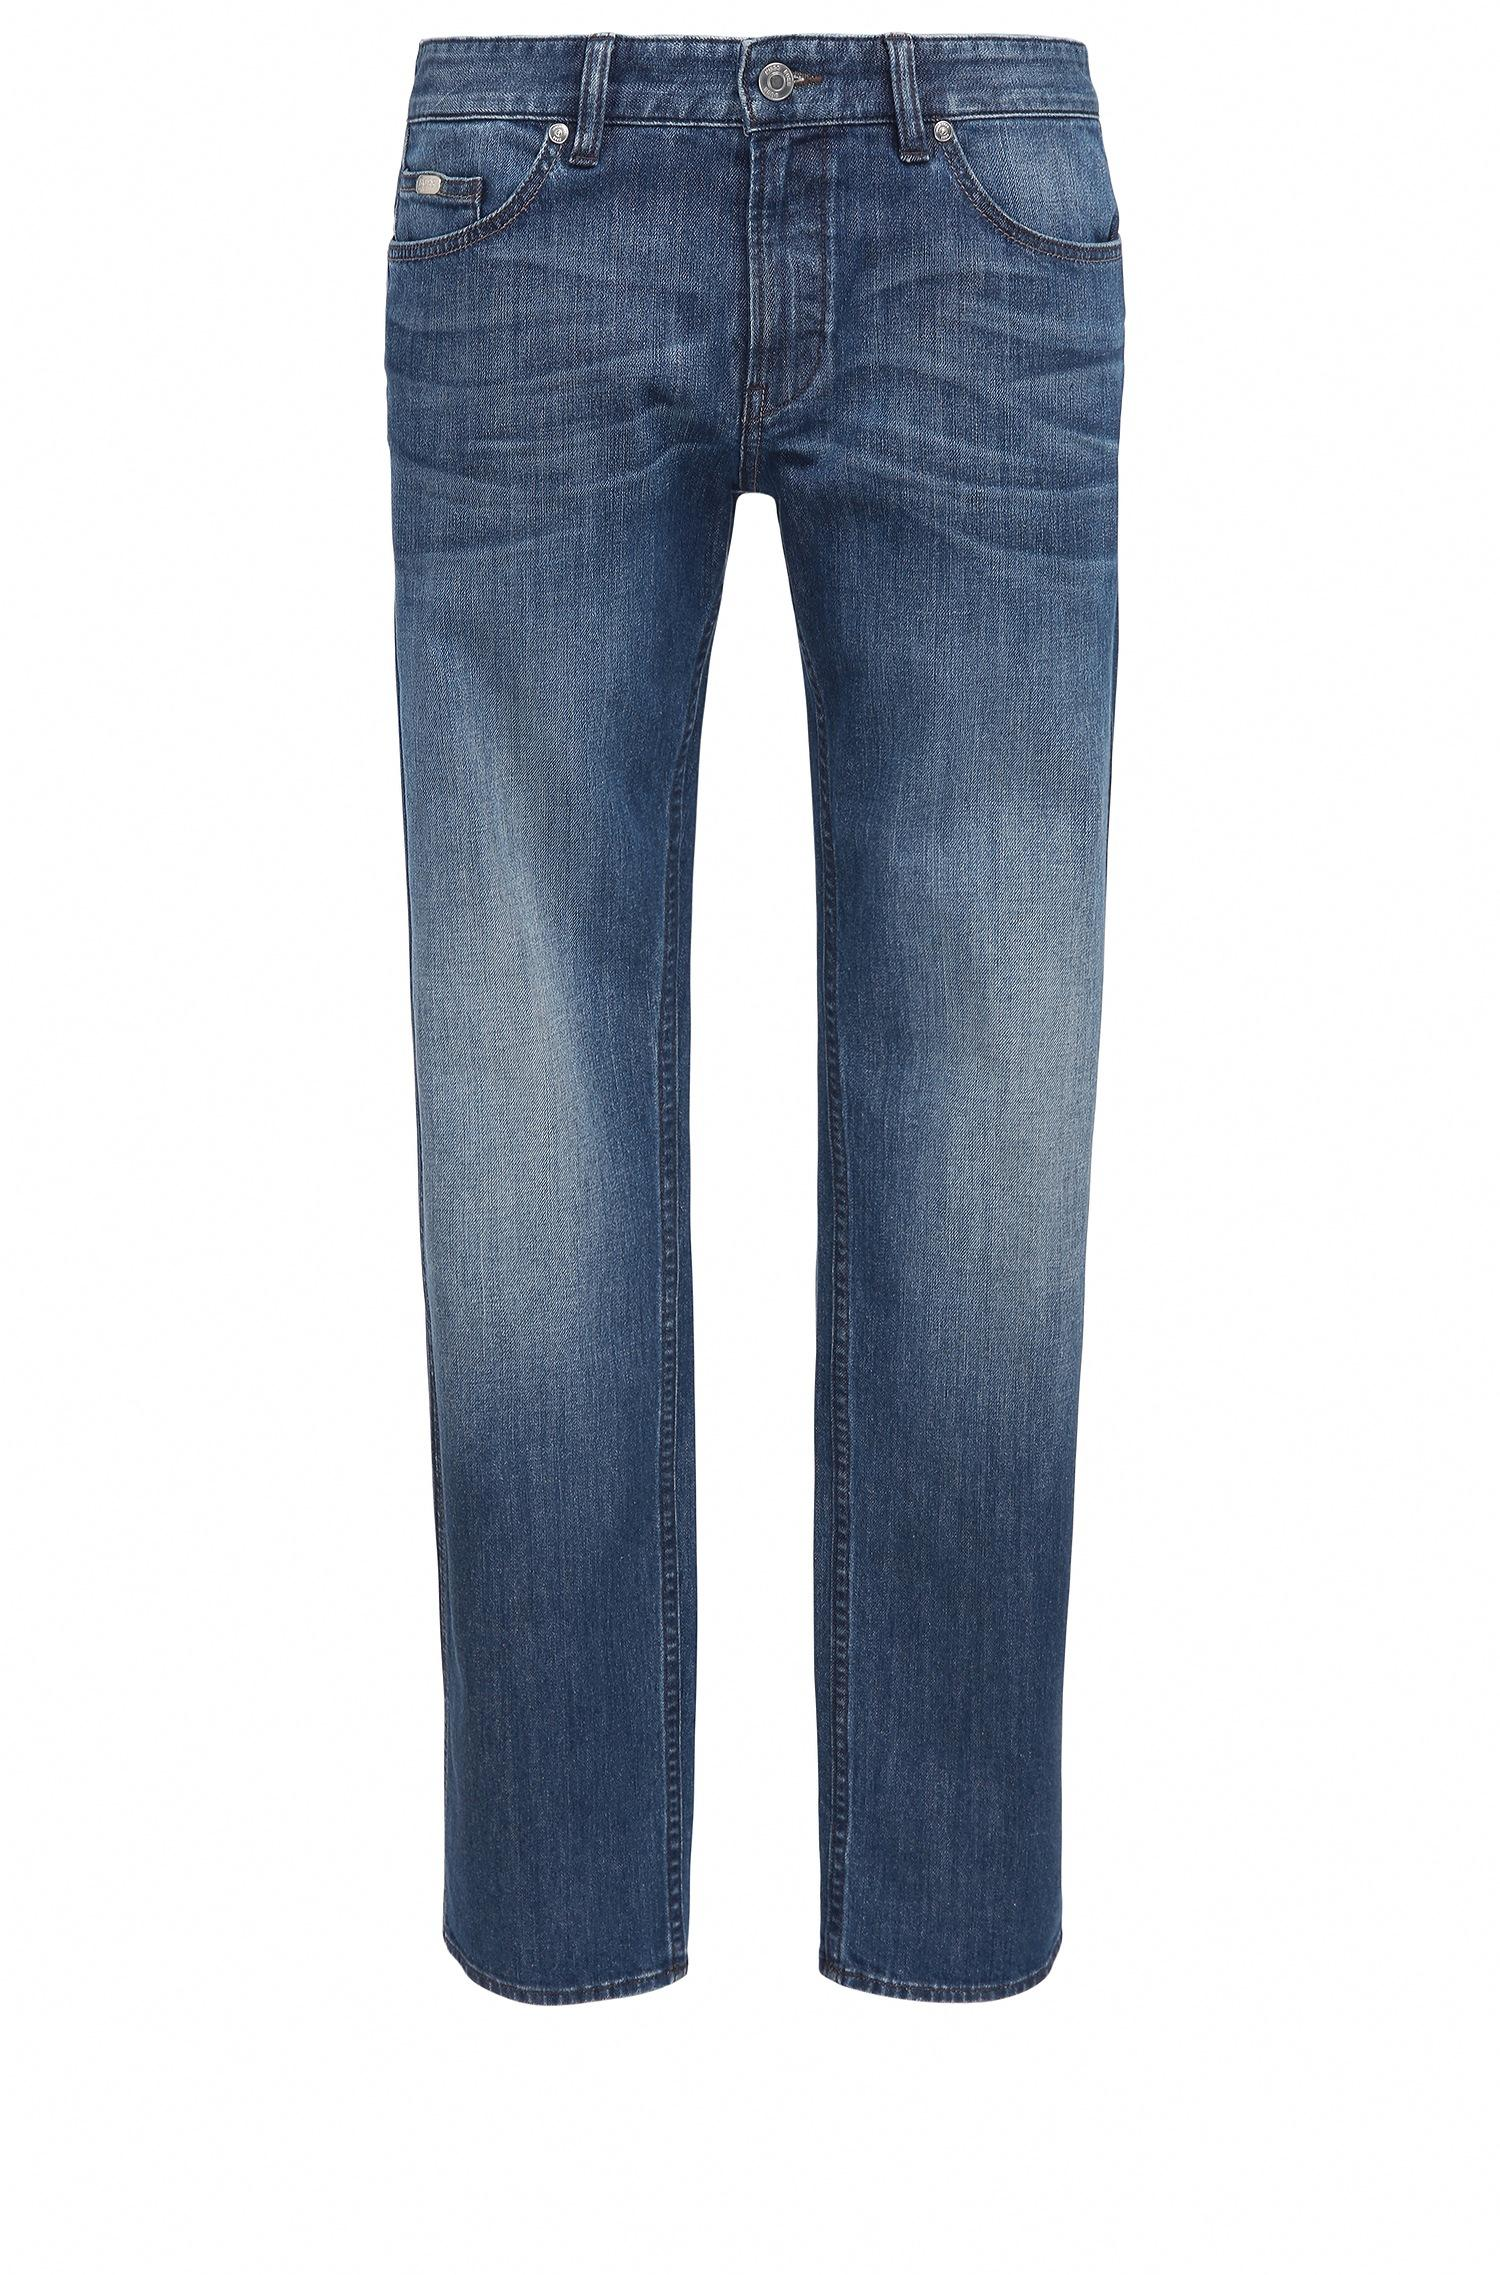 boss green slim fit jeans in comfort stretch denim in blue. Black Bedroom Furniture Sets. Home Design Ideas